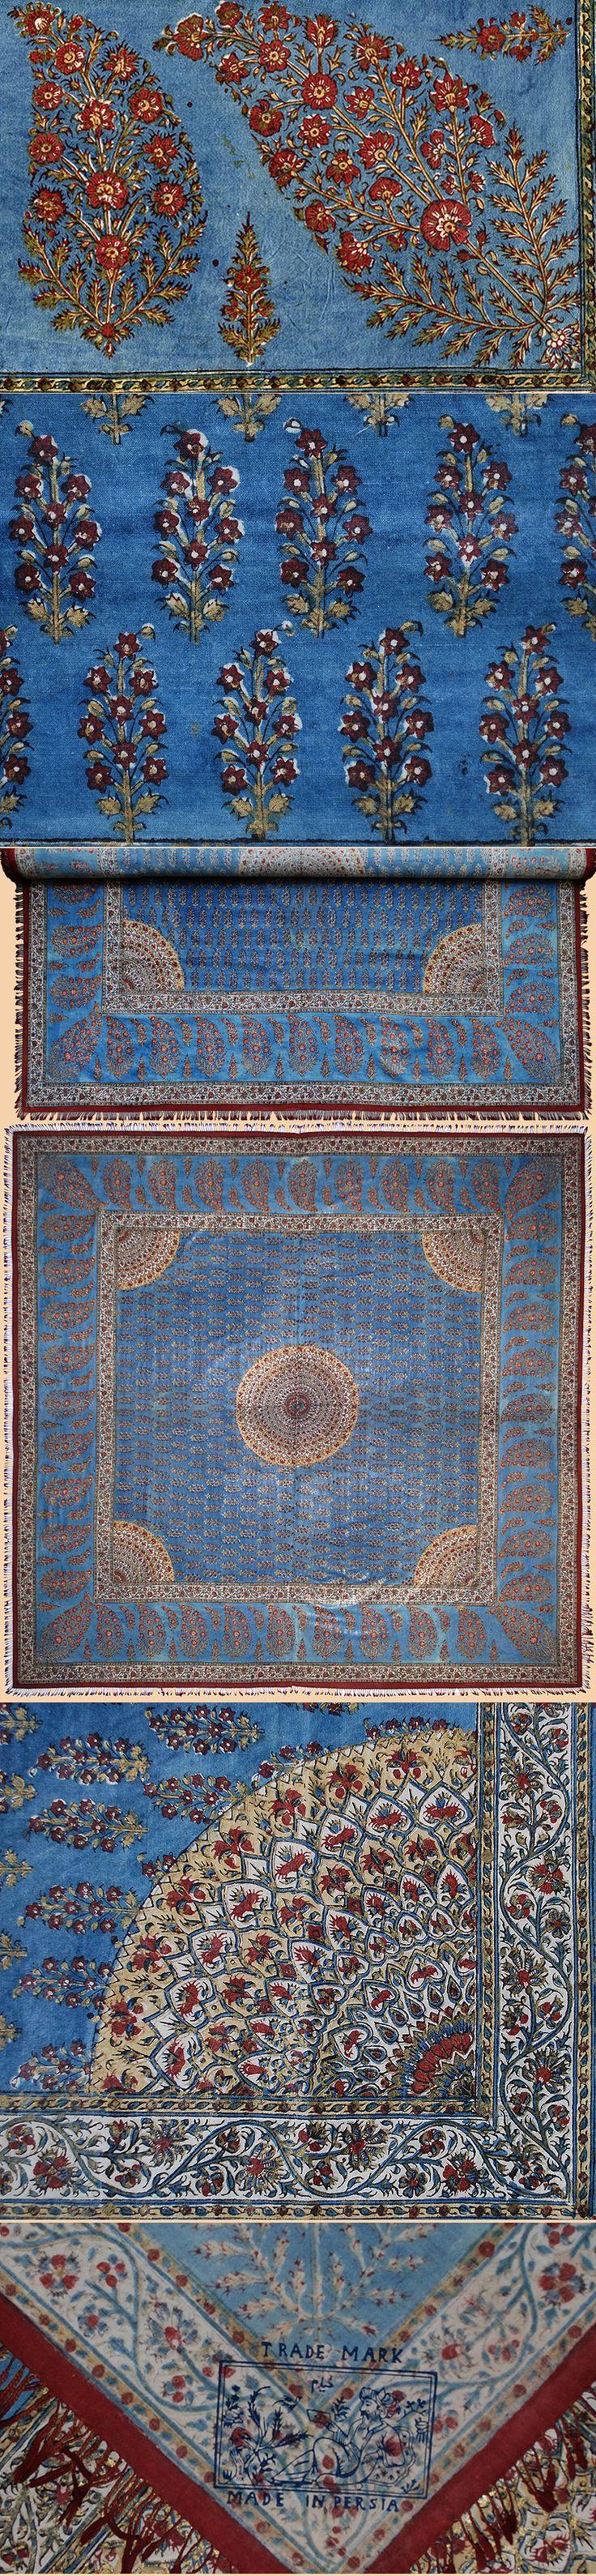 Persian Block Print with Gold Moom Shawl Early 19th Century  Qajar Dynasty 1795 - 1925 A.D